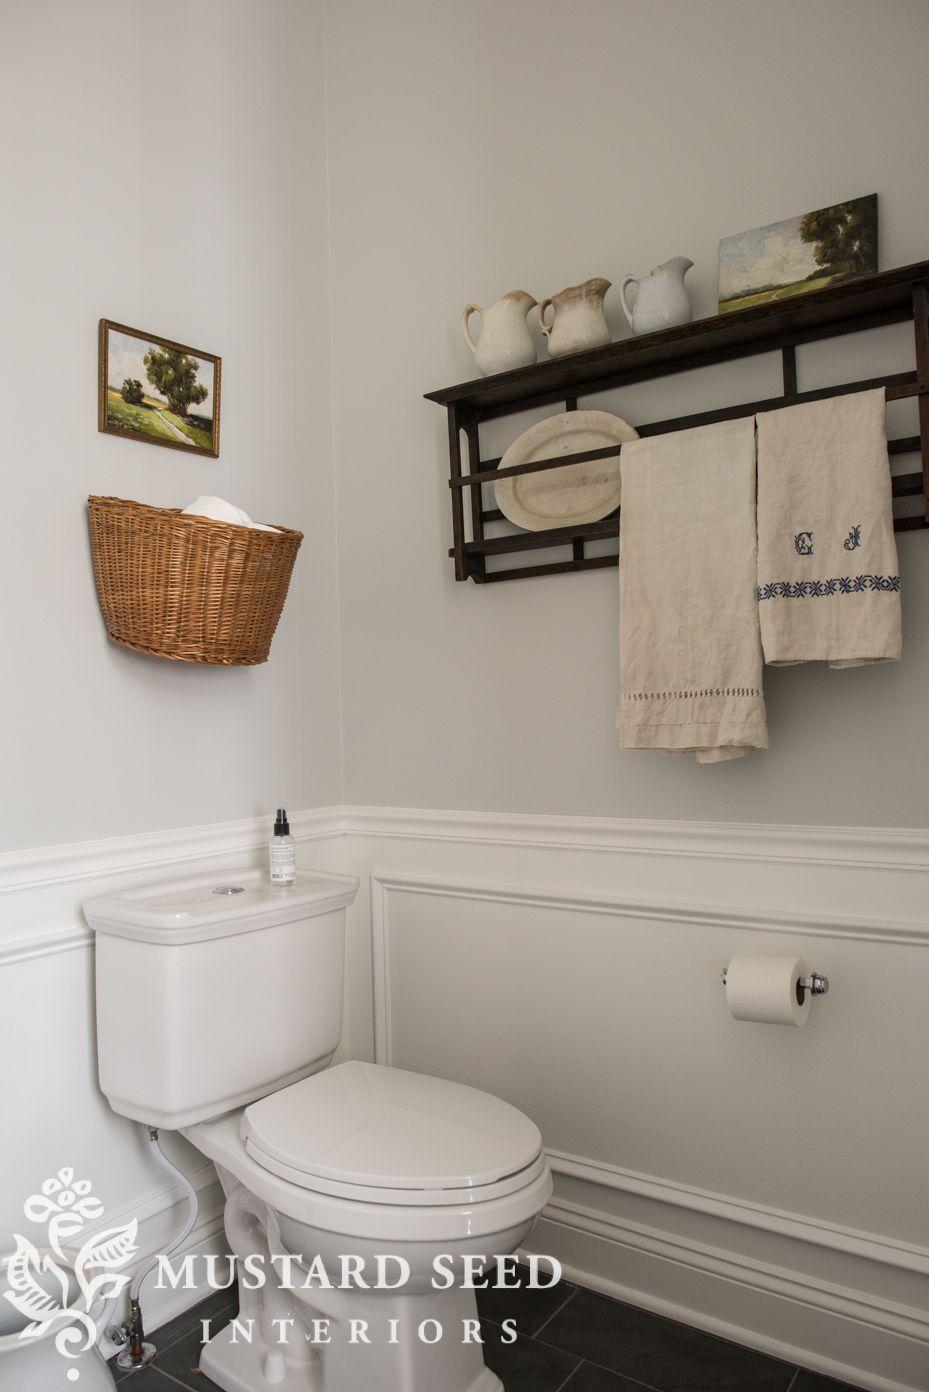 Picture Frame Molding In The 1 2 Bath Miss Mustard Seed Mold In Bathroom Diy Bathroom Decor Bathroom Decor